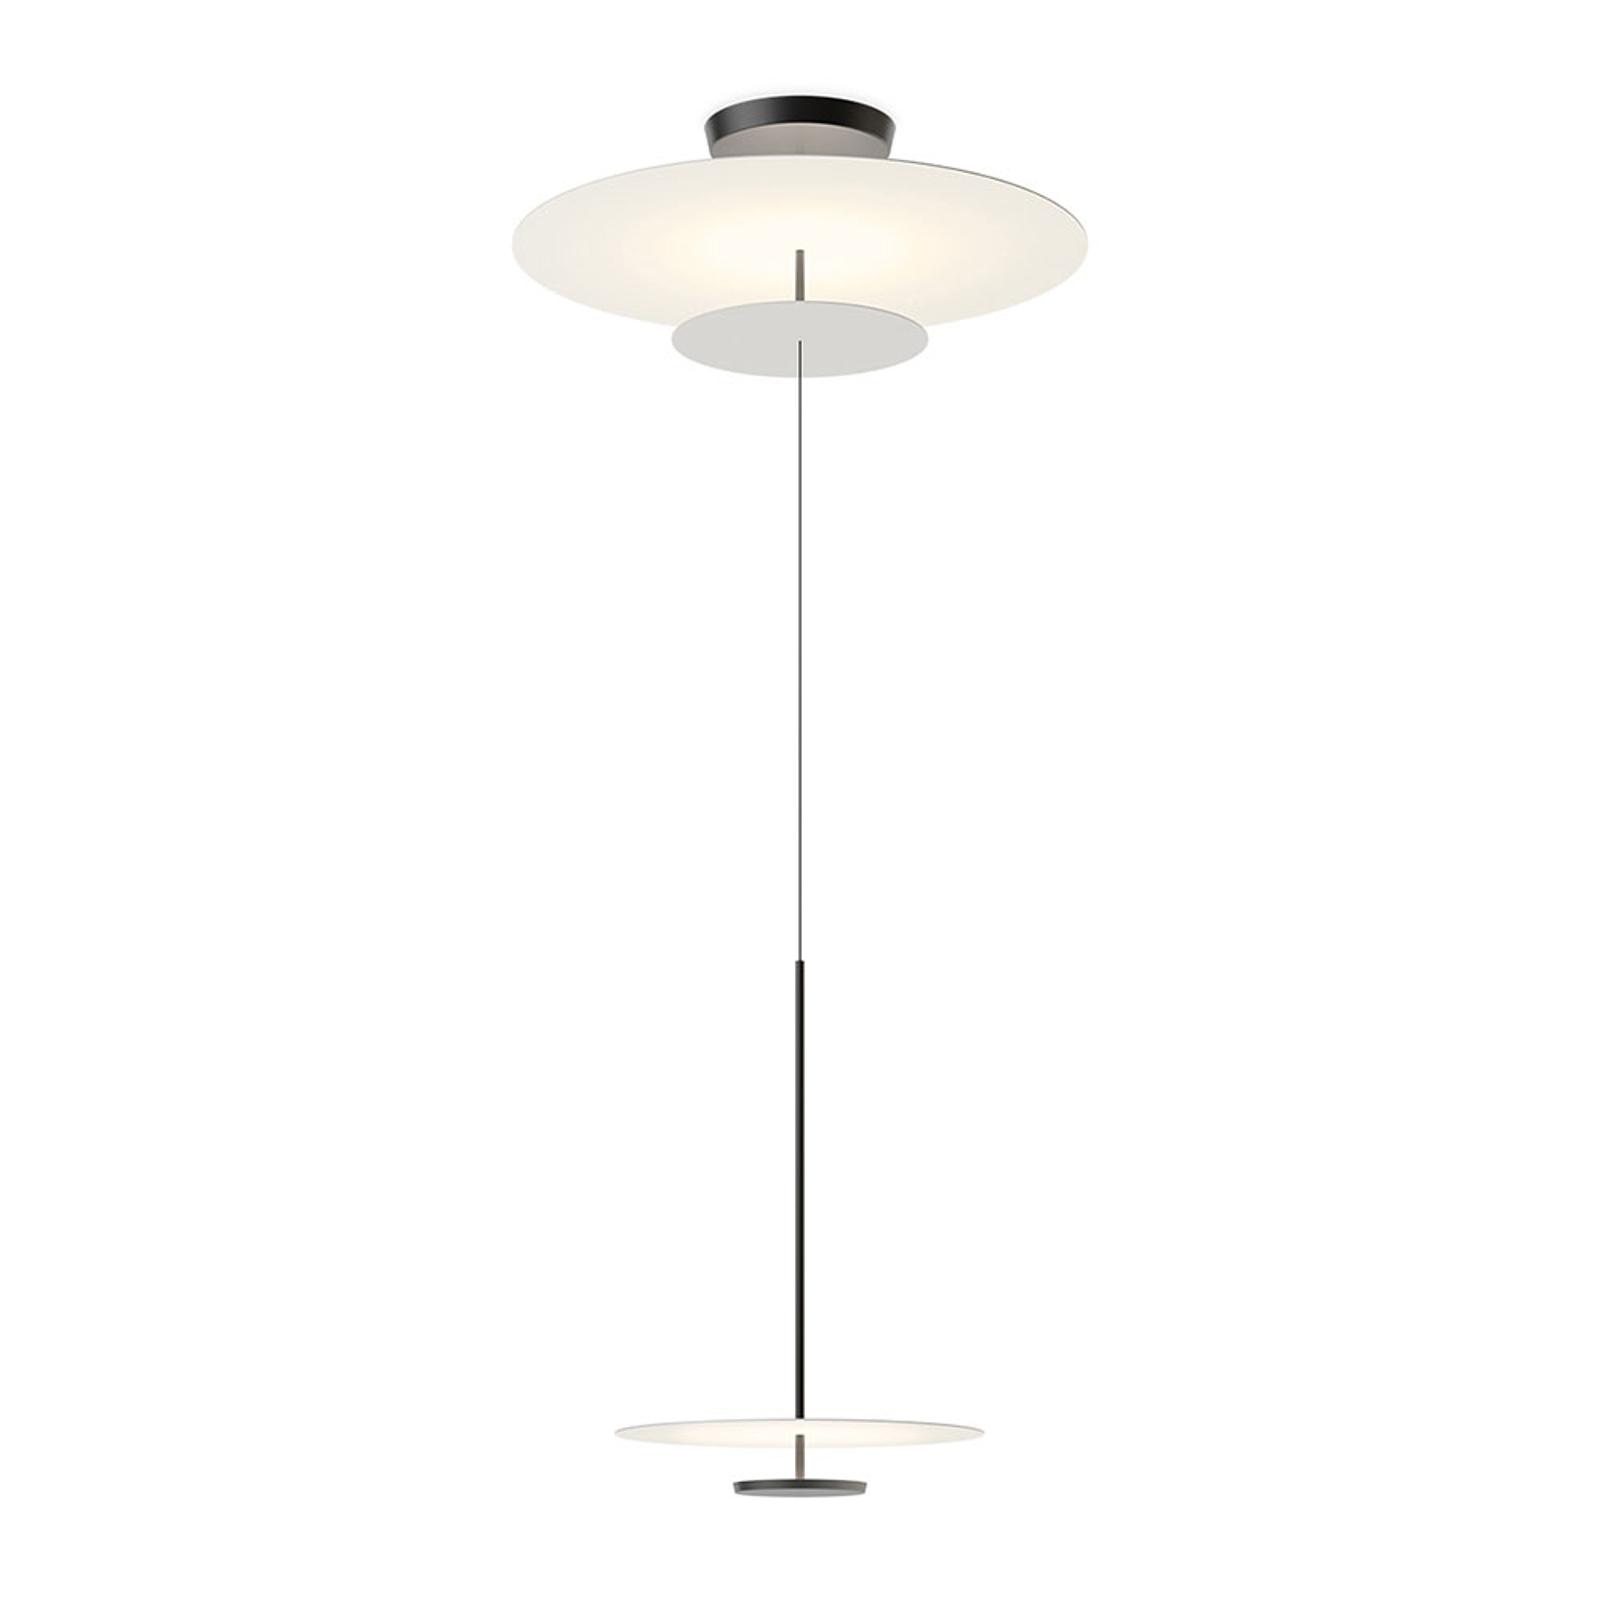 Vibia Flat LED-Hängelampe 3-flg. Ø 90cm grau L1